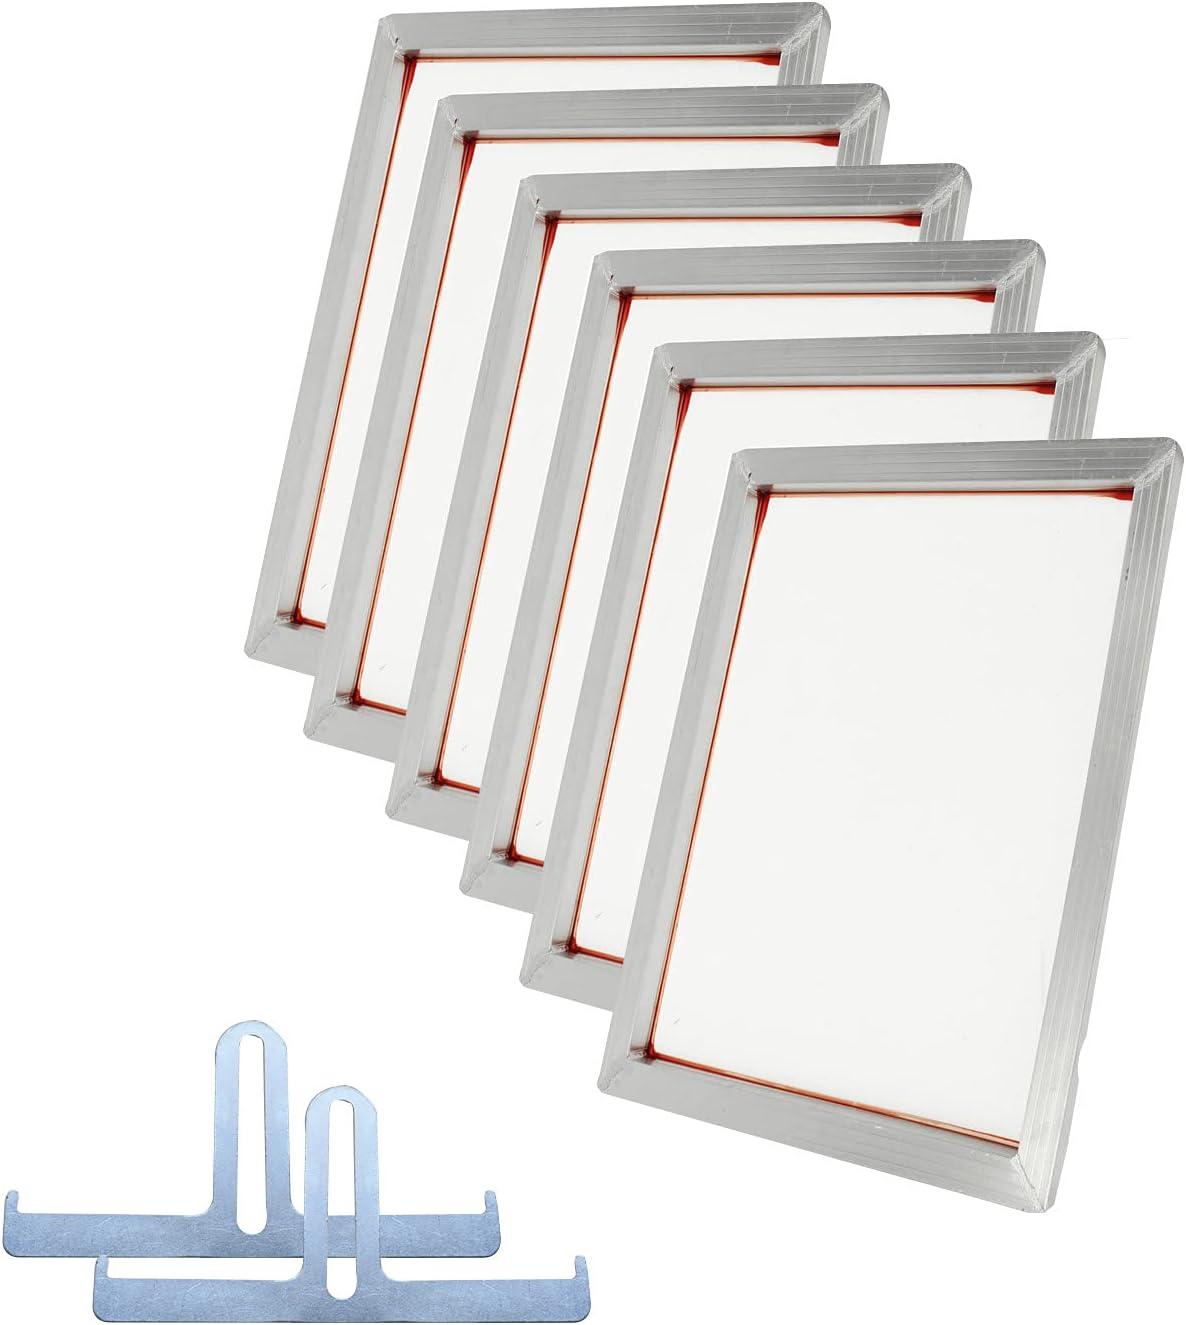 TECHTONGDA 6Pcs 110 Mesh 43T Screen Fra Ranking TOP18 Long-awaited 8x14inch Silk Printing